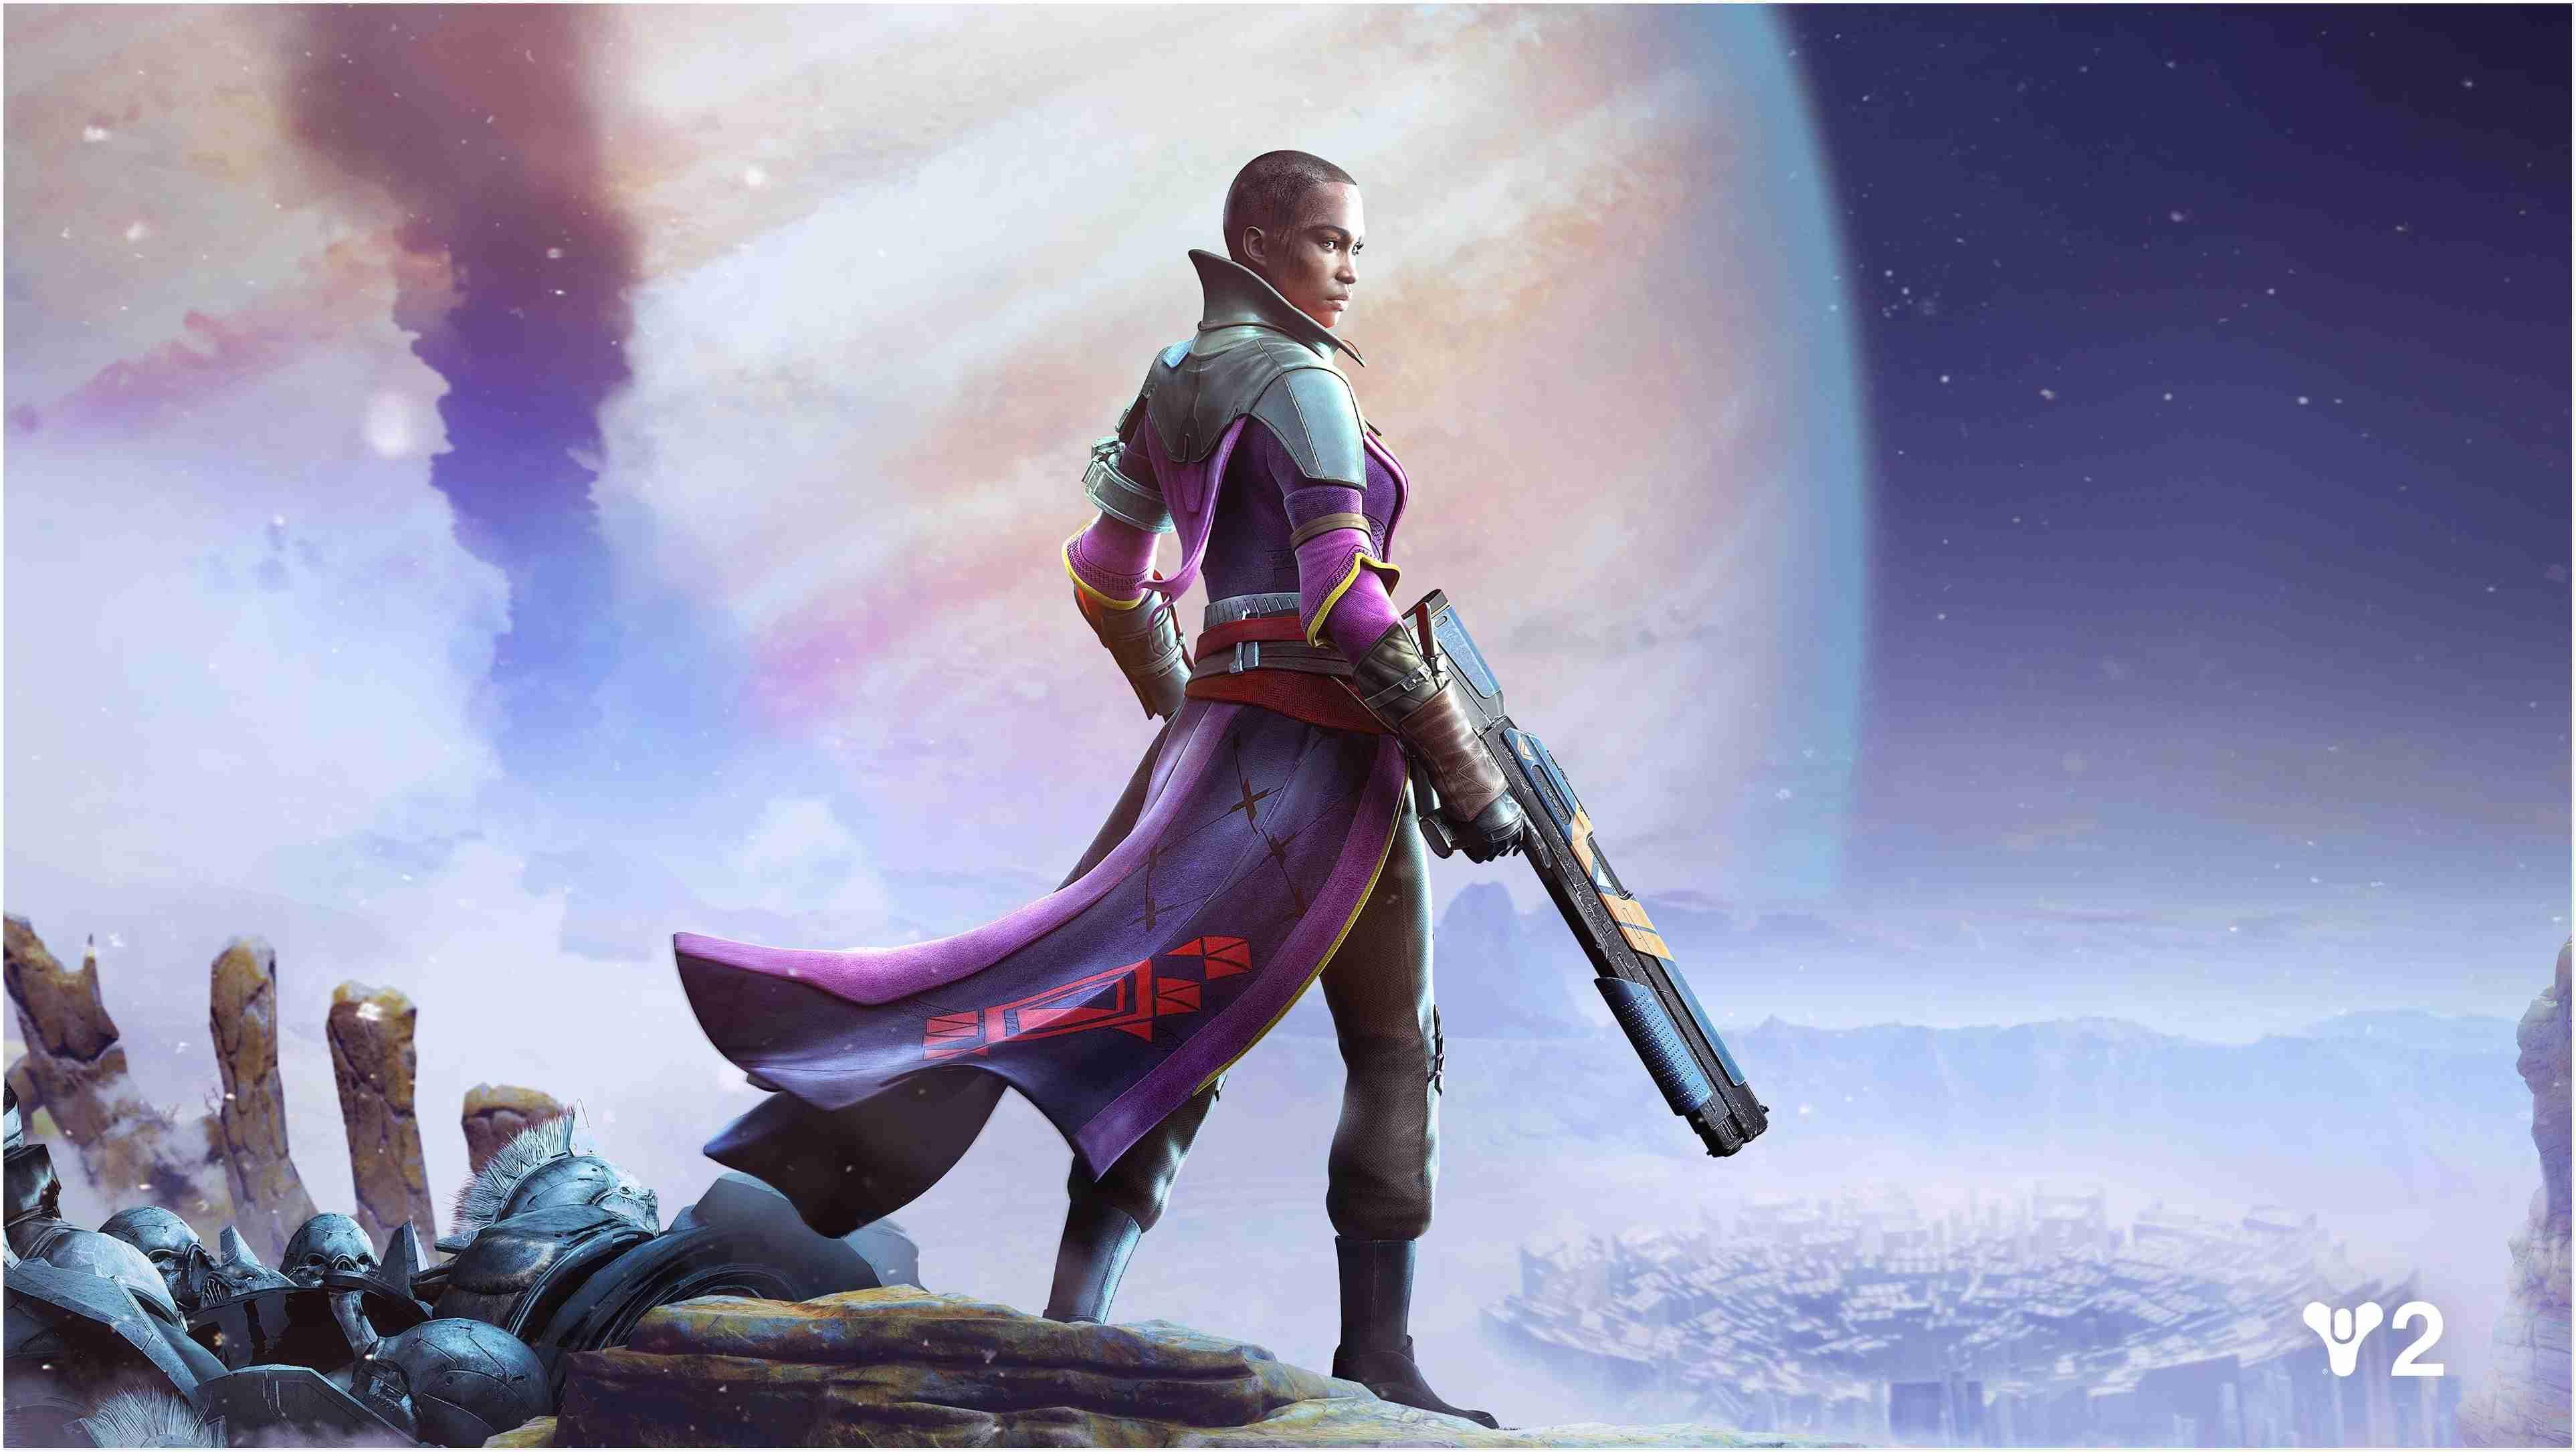 Destiny 2 Wallpapers Hd For Desktop, Laptop, Tablet, - Destiny 2 Ikora Rey , HD Wallpaper & Backgrounds